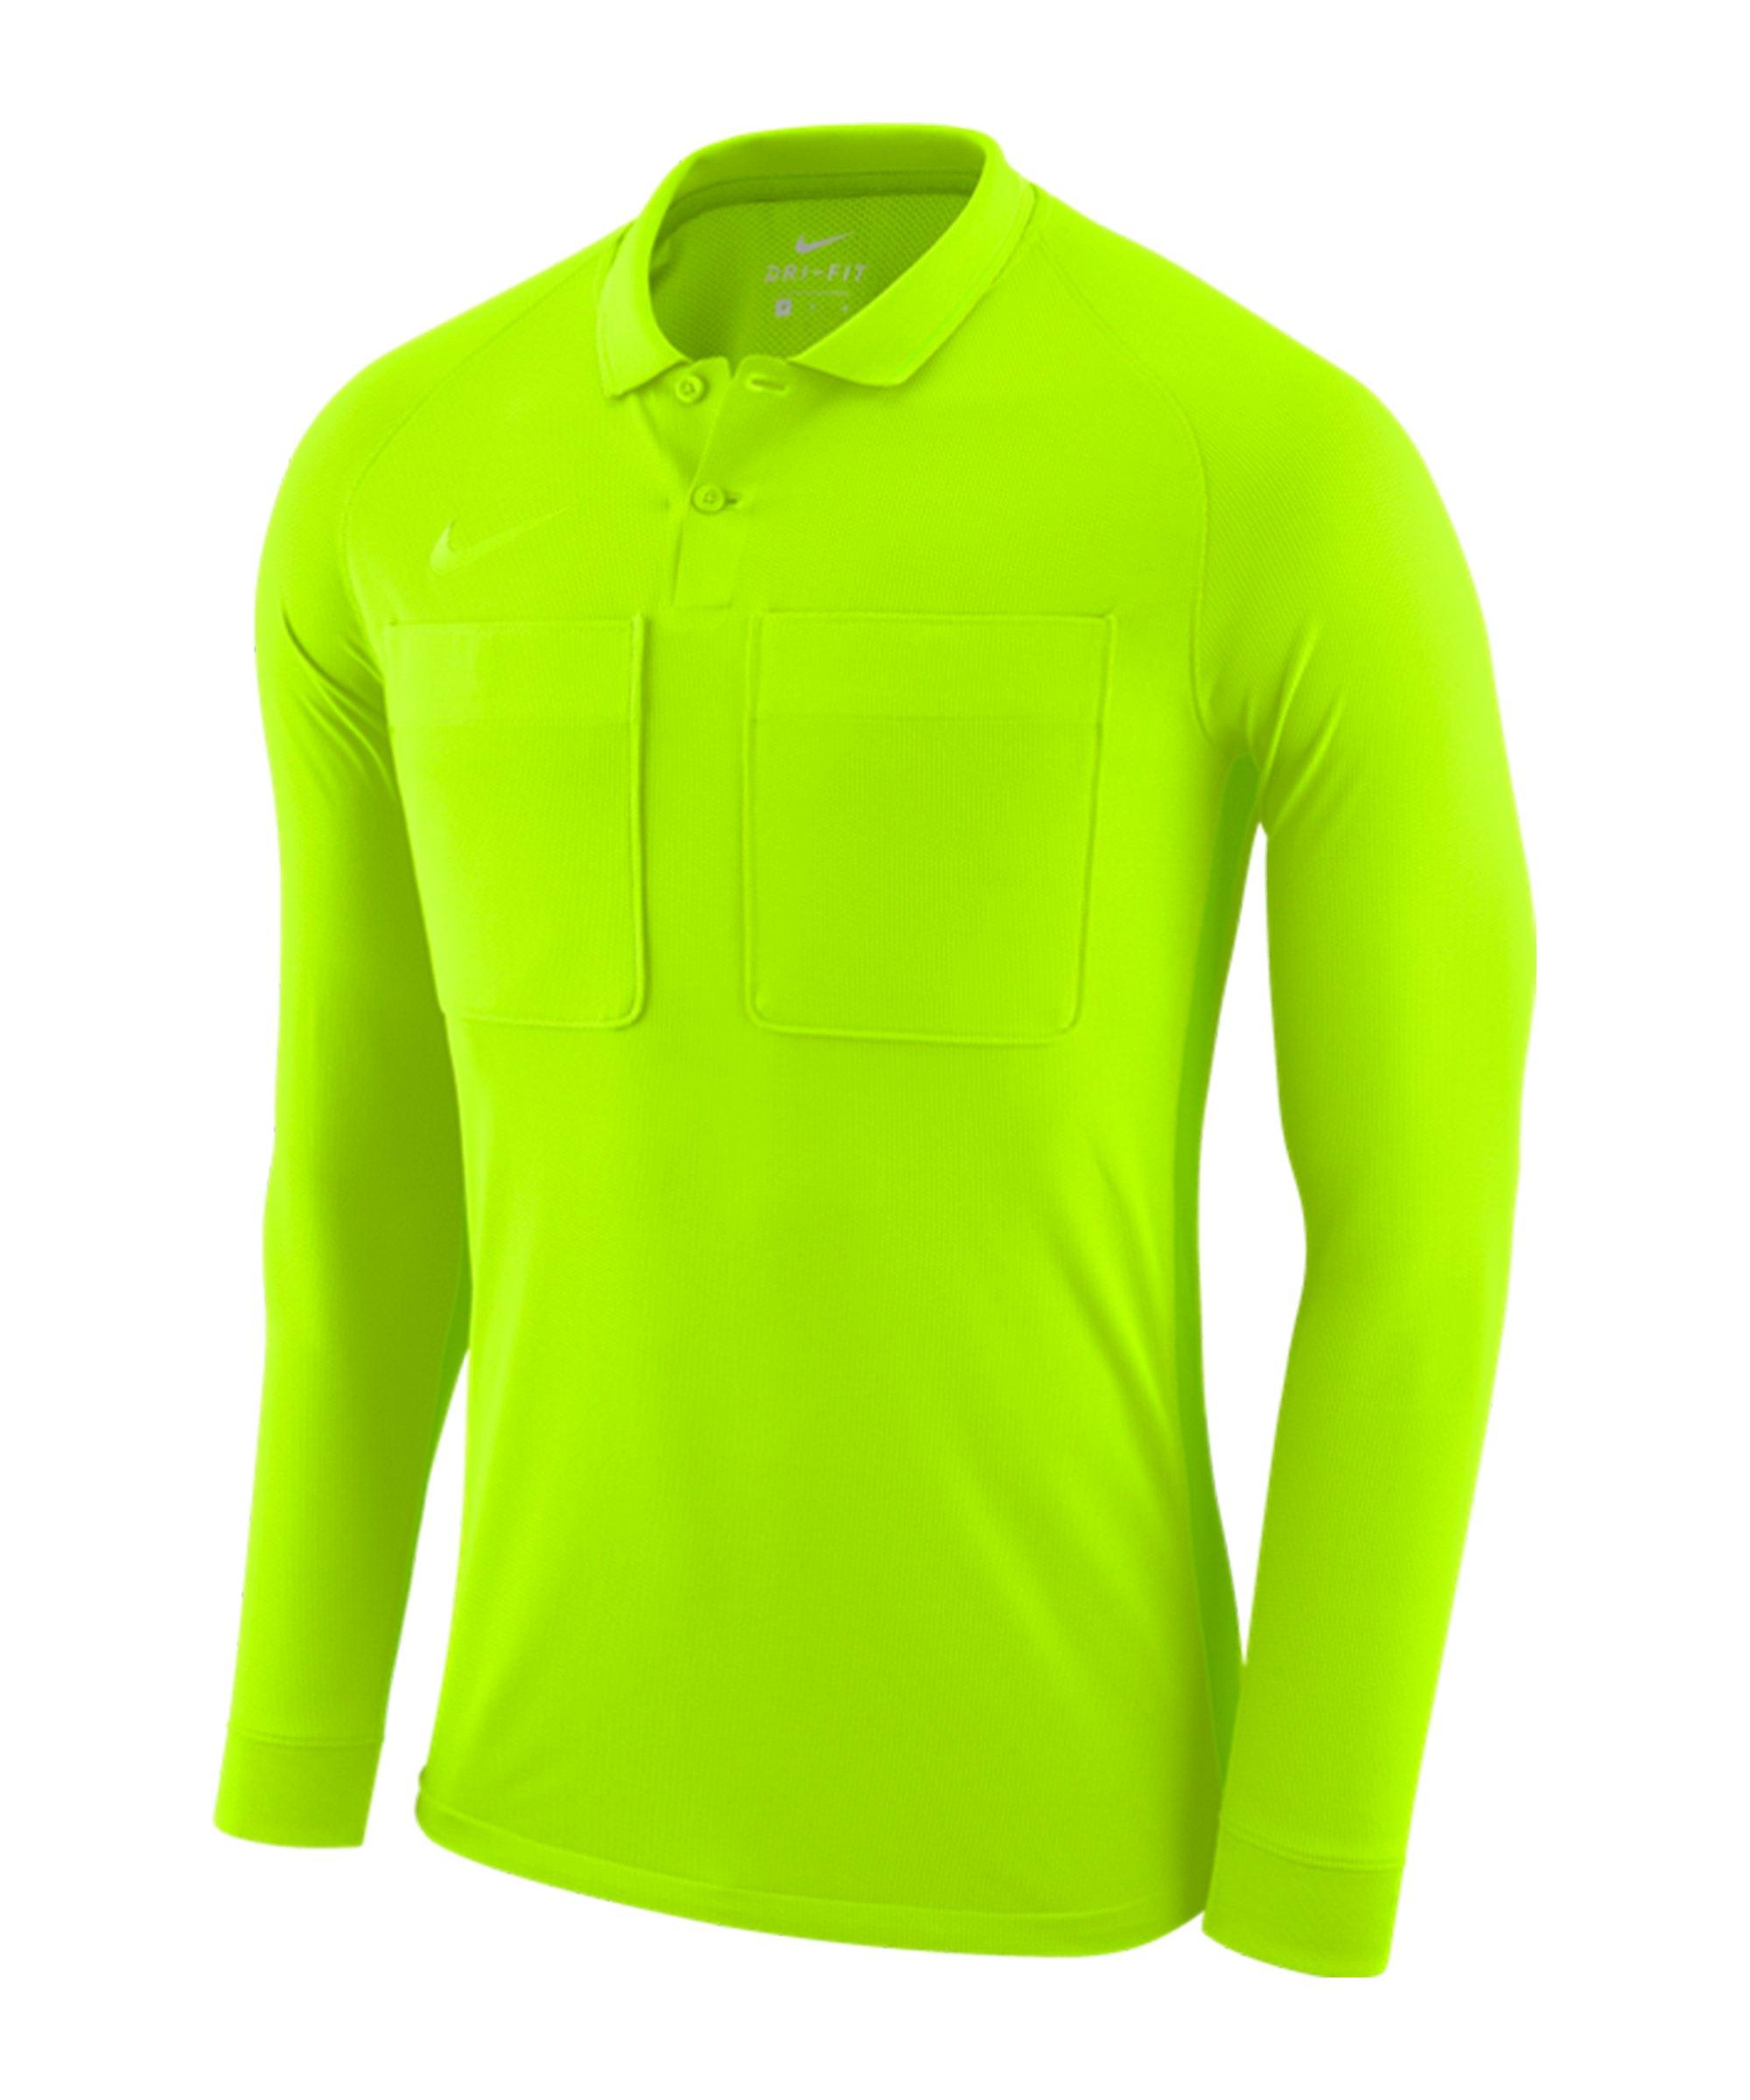 Nike Dry Referee Trikot langarm Grün F703 - gruen